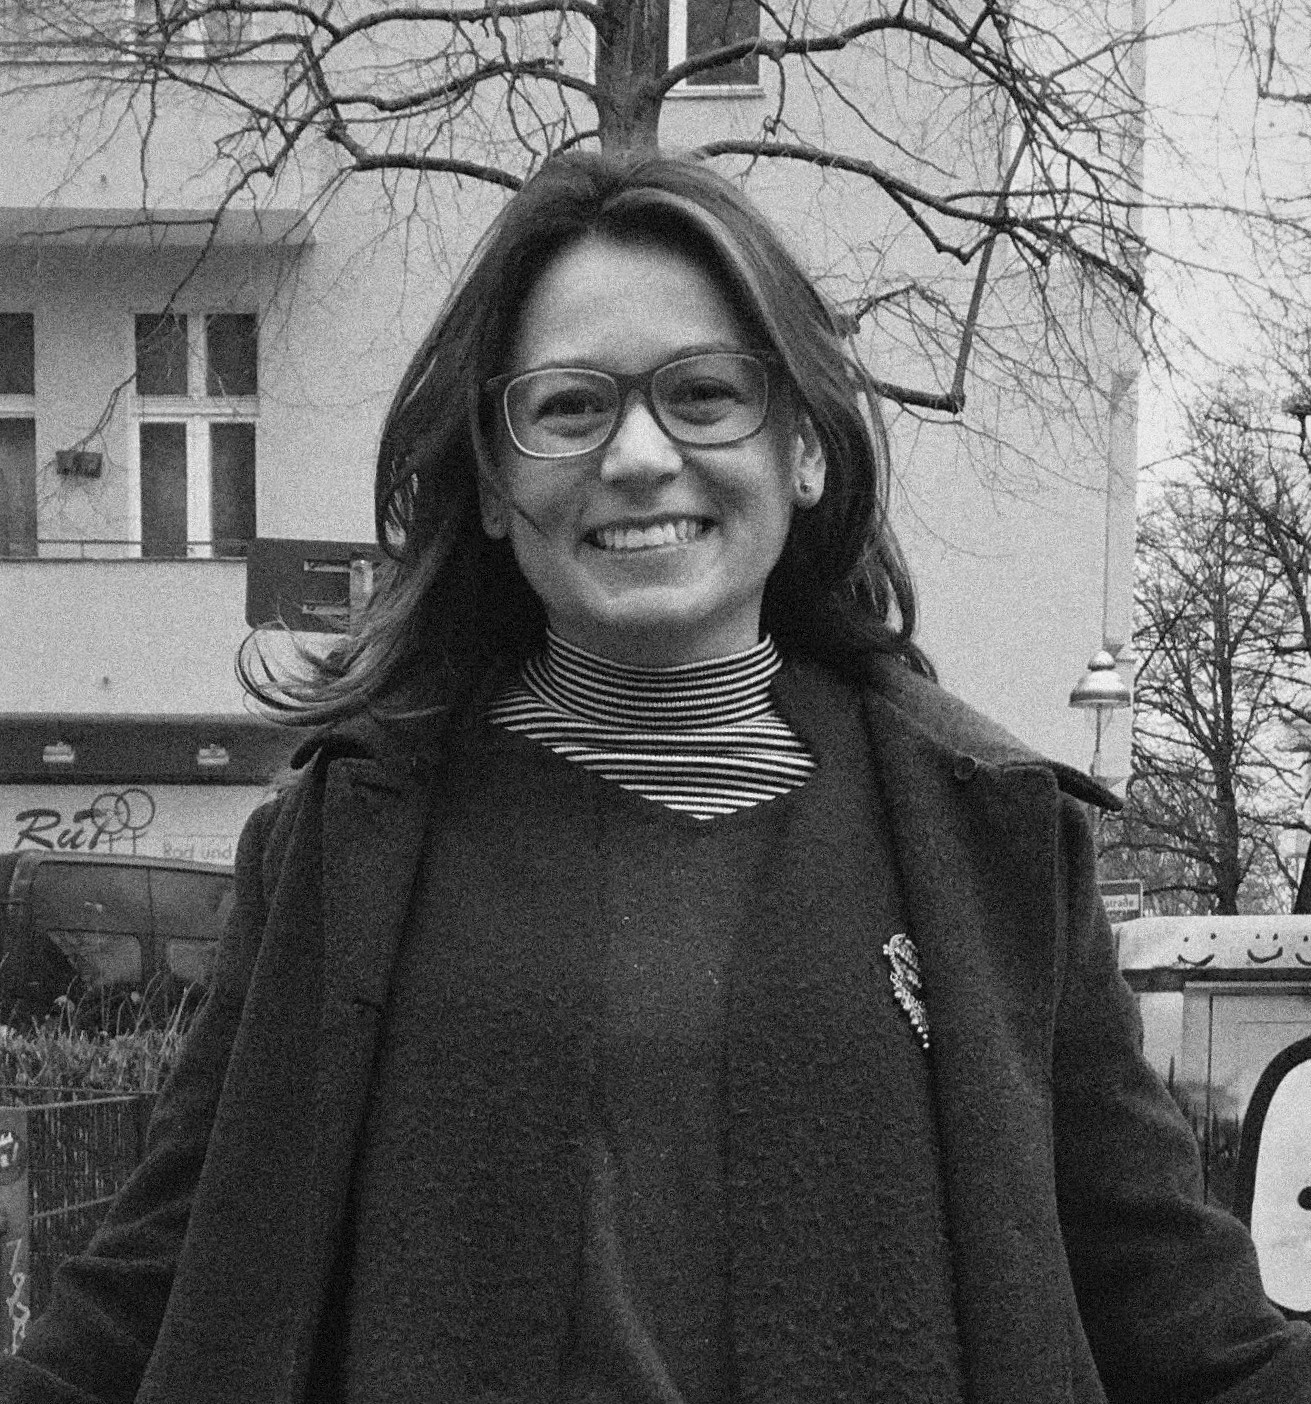 Dr. Mónika Contreras Saiz